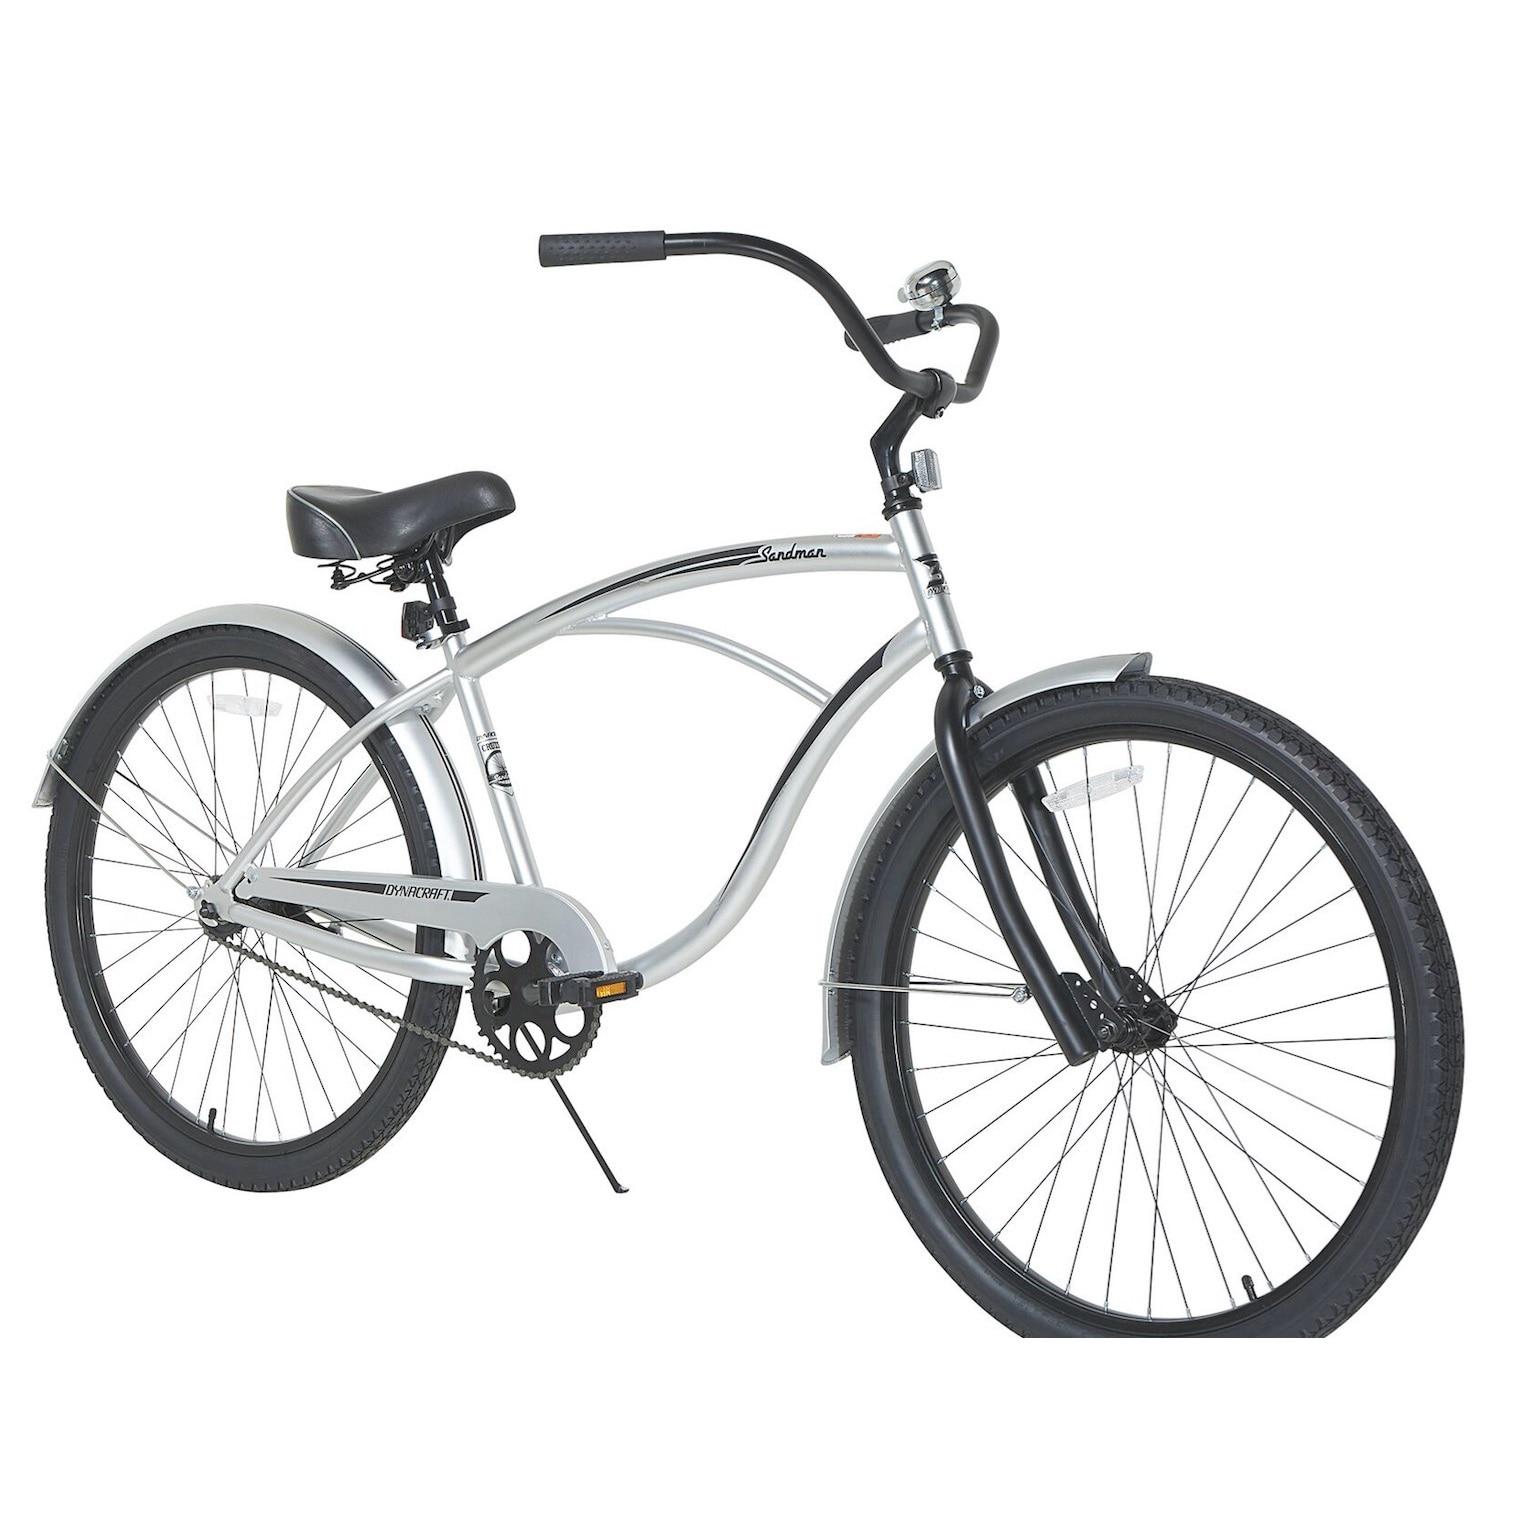 134dbe7534e Shop Dynacraft Sandman 26-inch Bike - Free Shipping Today - Overstock -  12378599